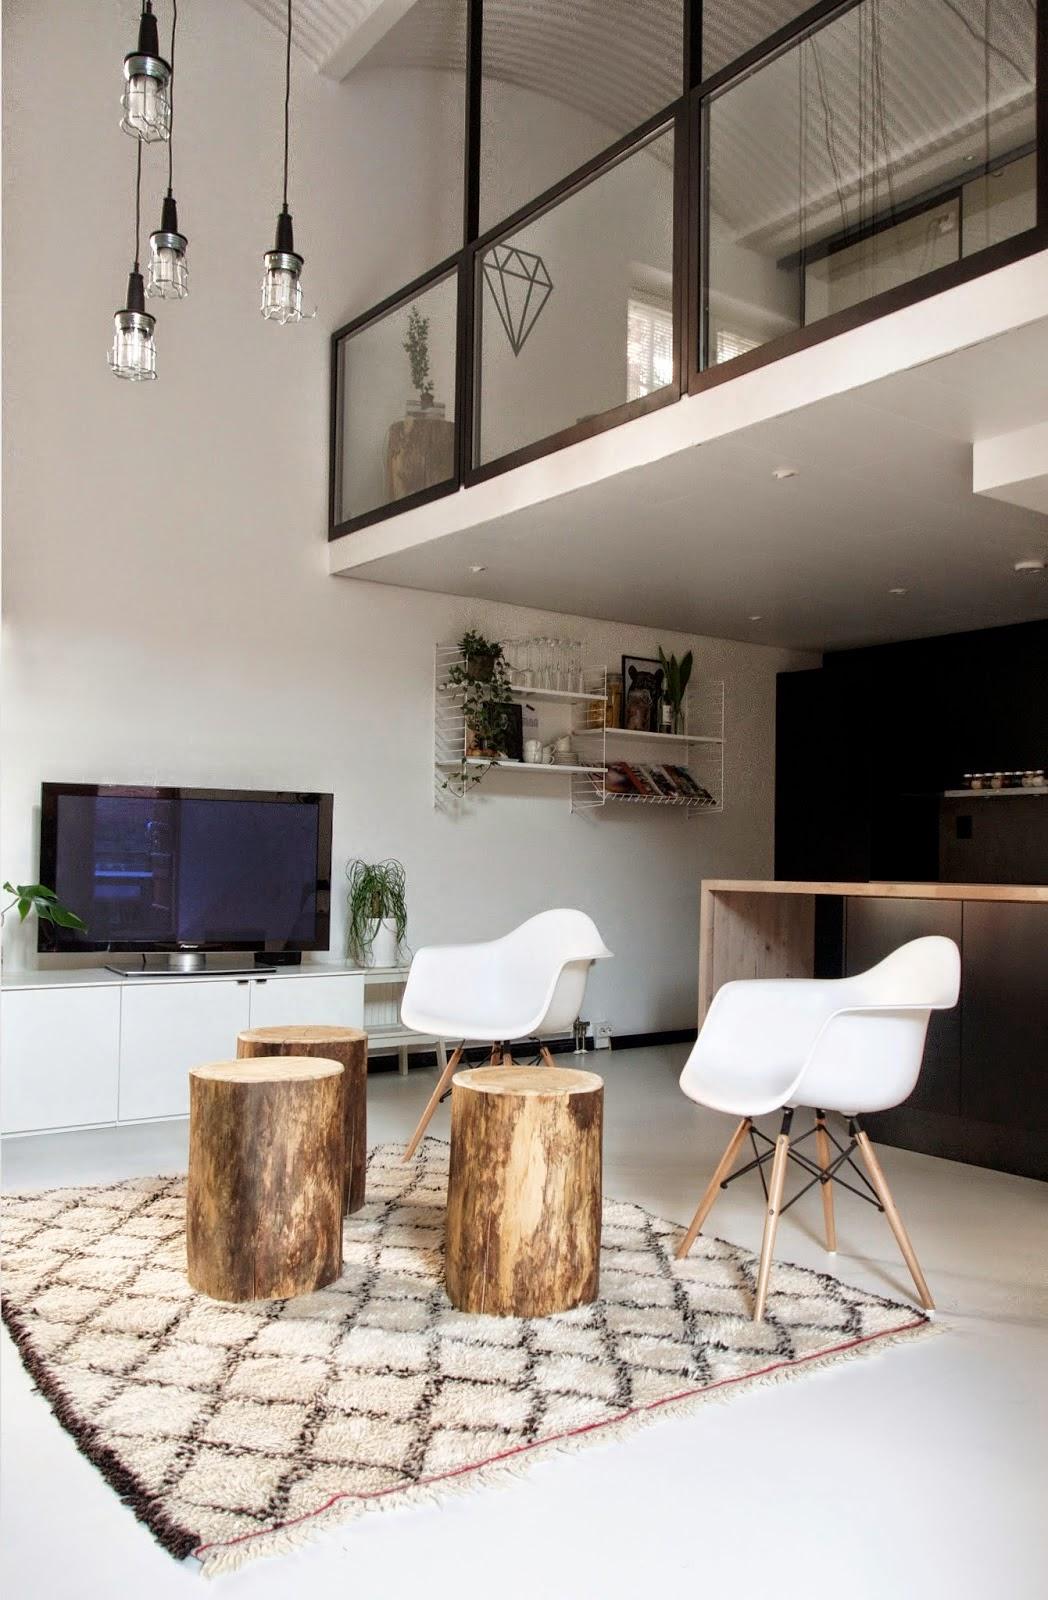 la petite fabrique de r ves scandinavian blog muotopuoli. Black Bedroom Furniture Sets. Home Design Ideas